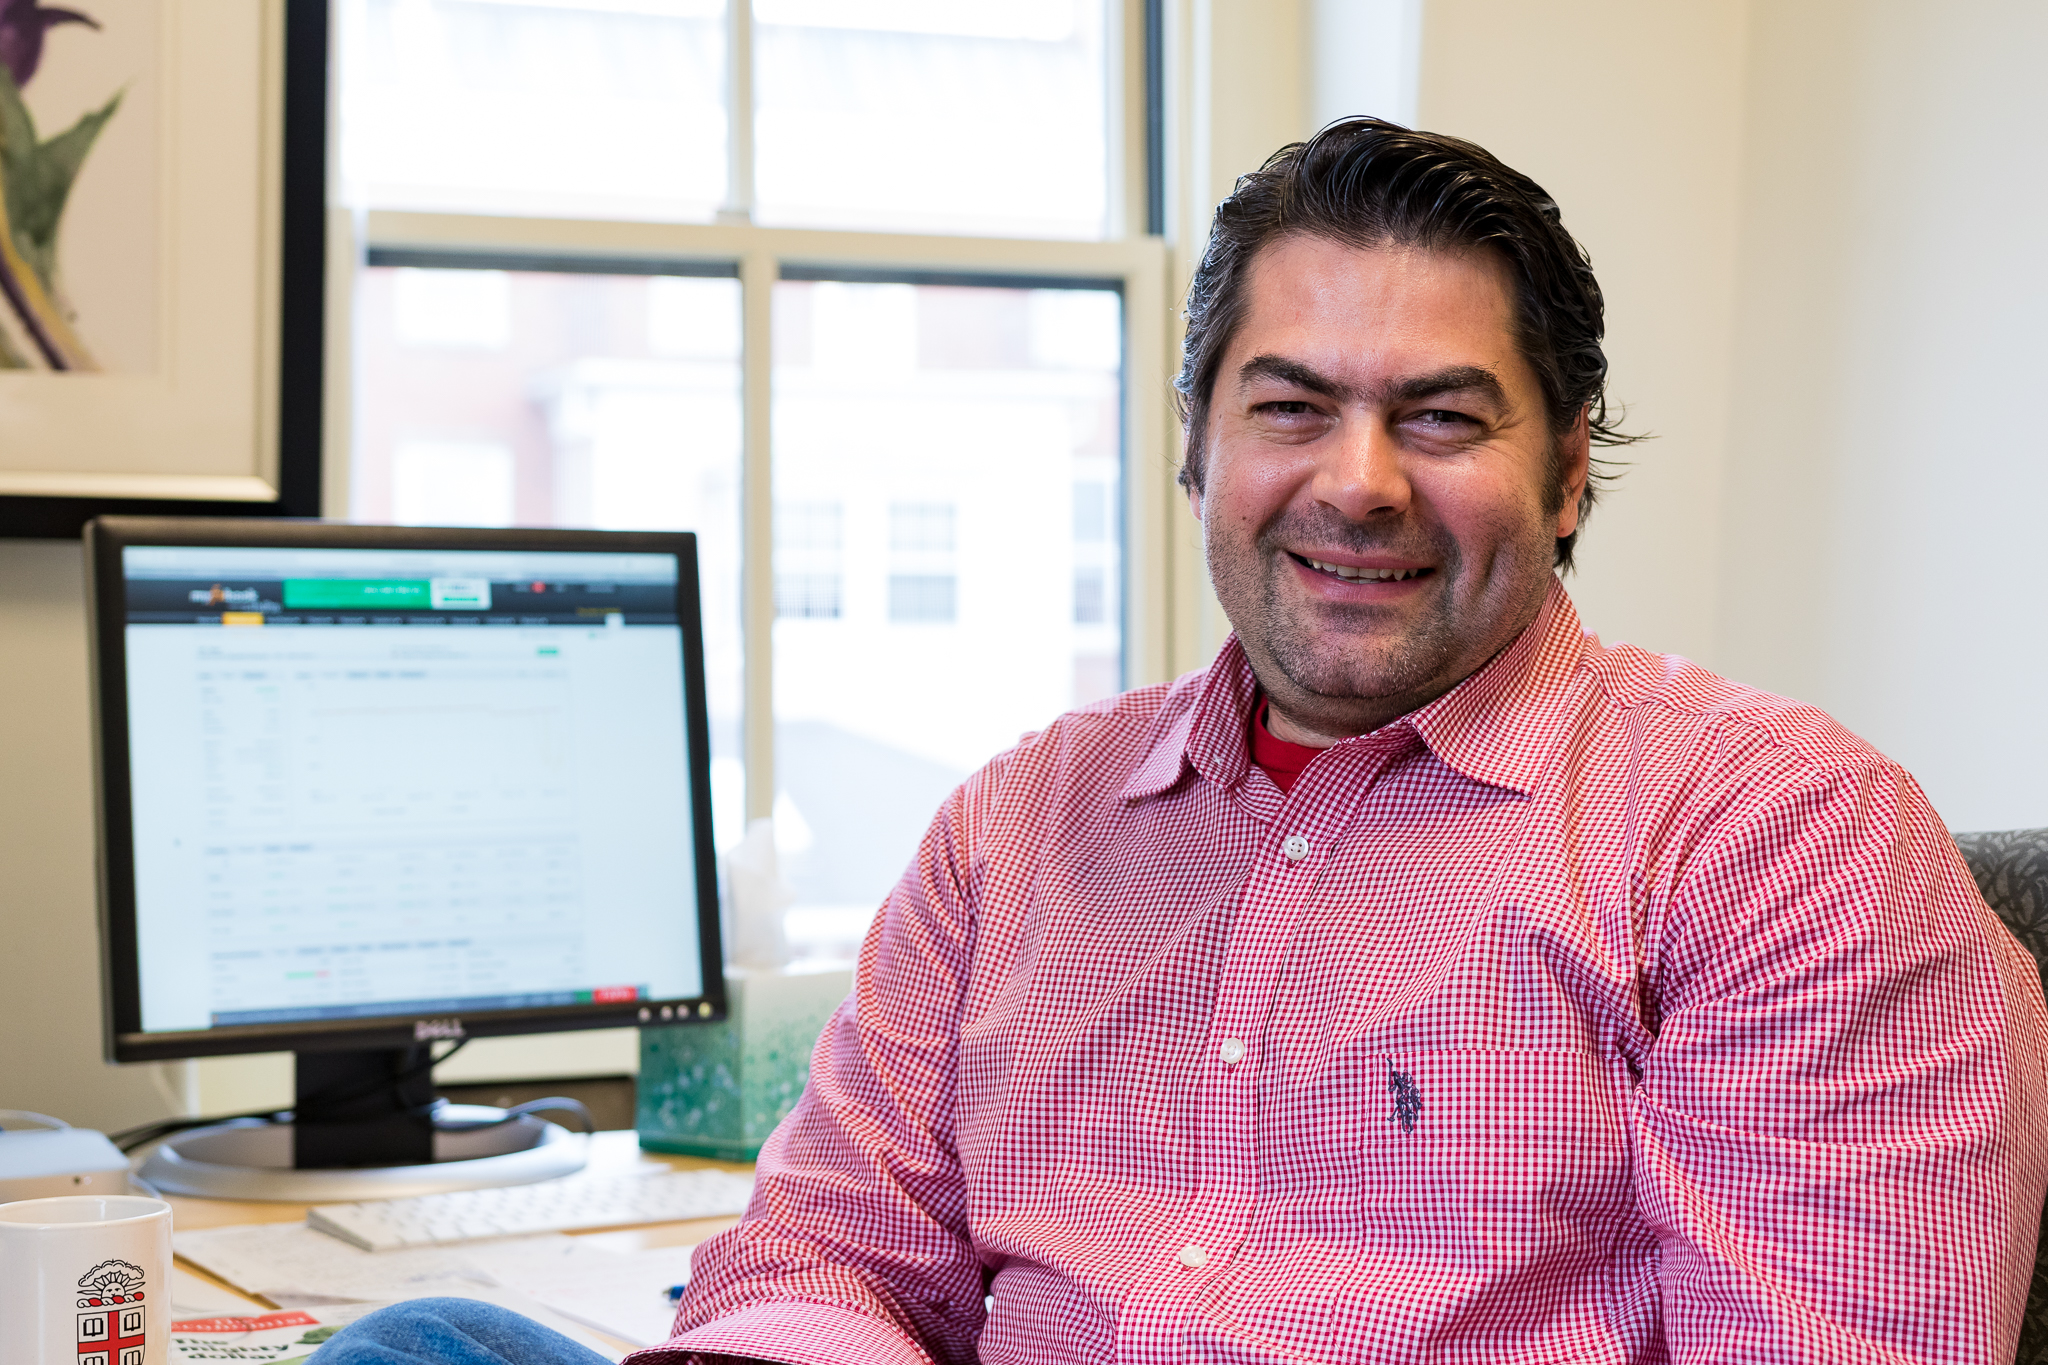 International Professor Profile: Grigorios Siourounis